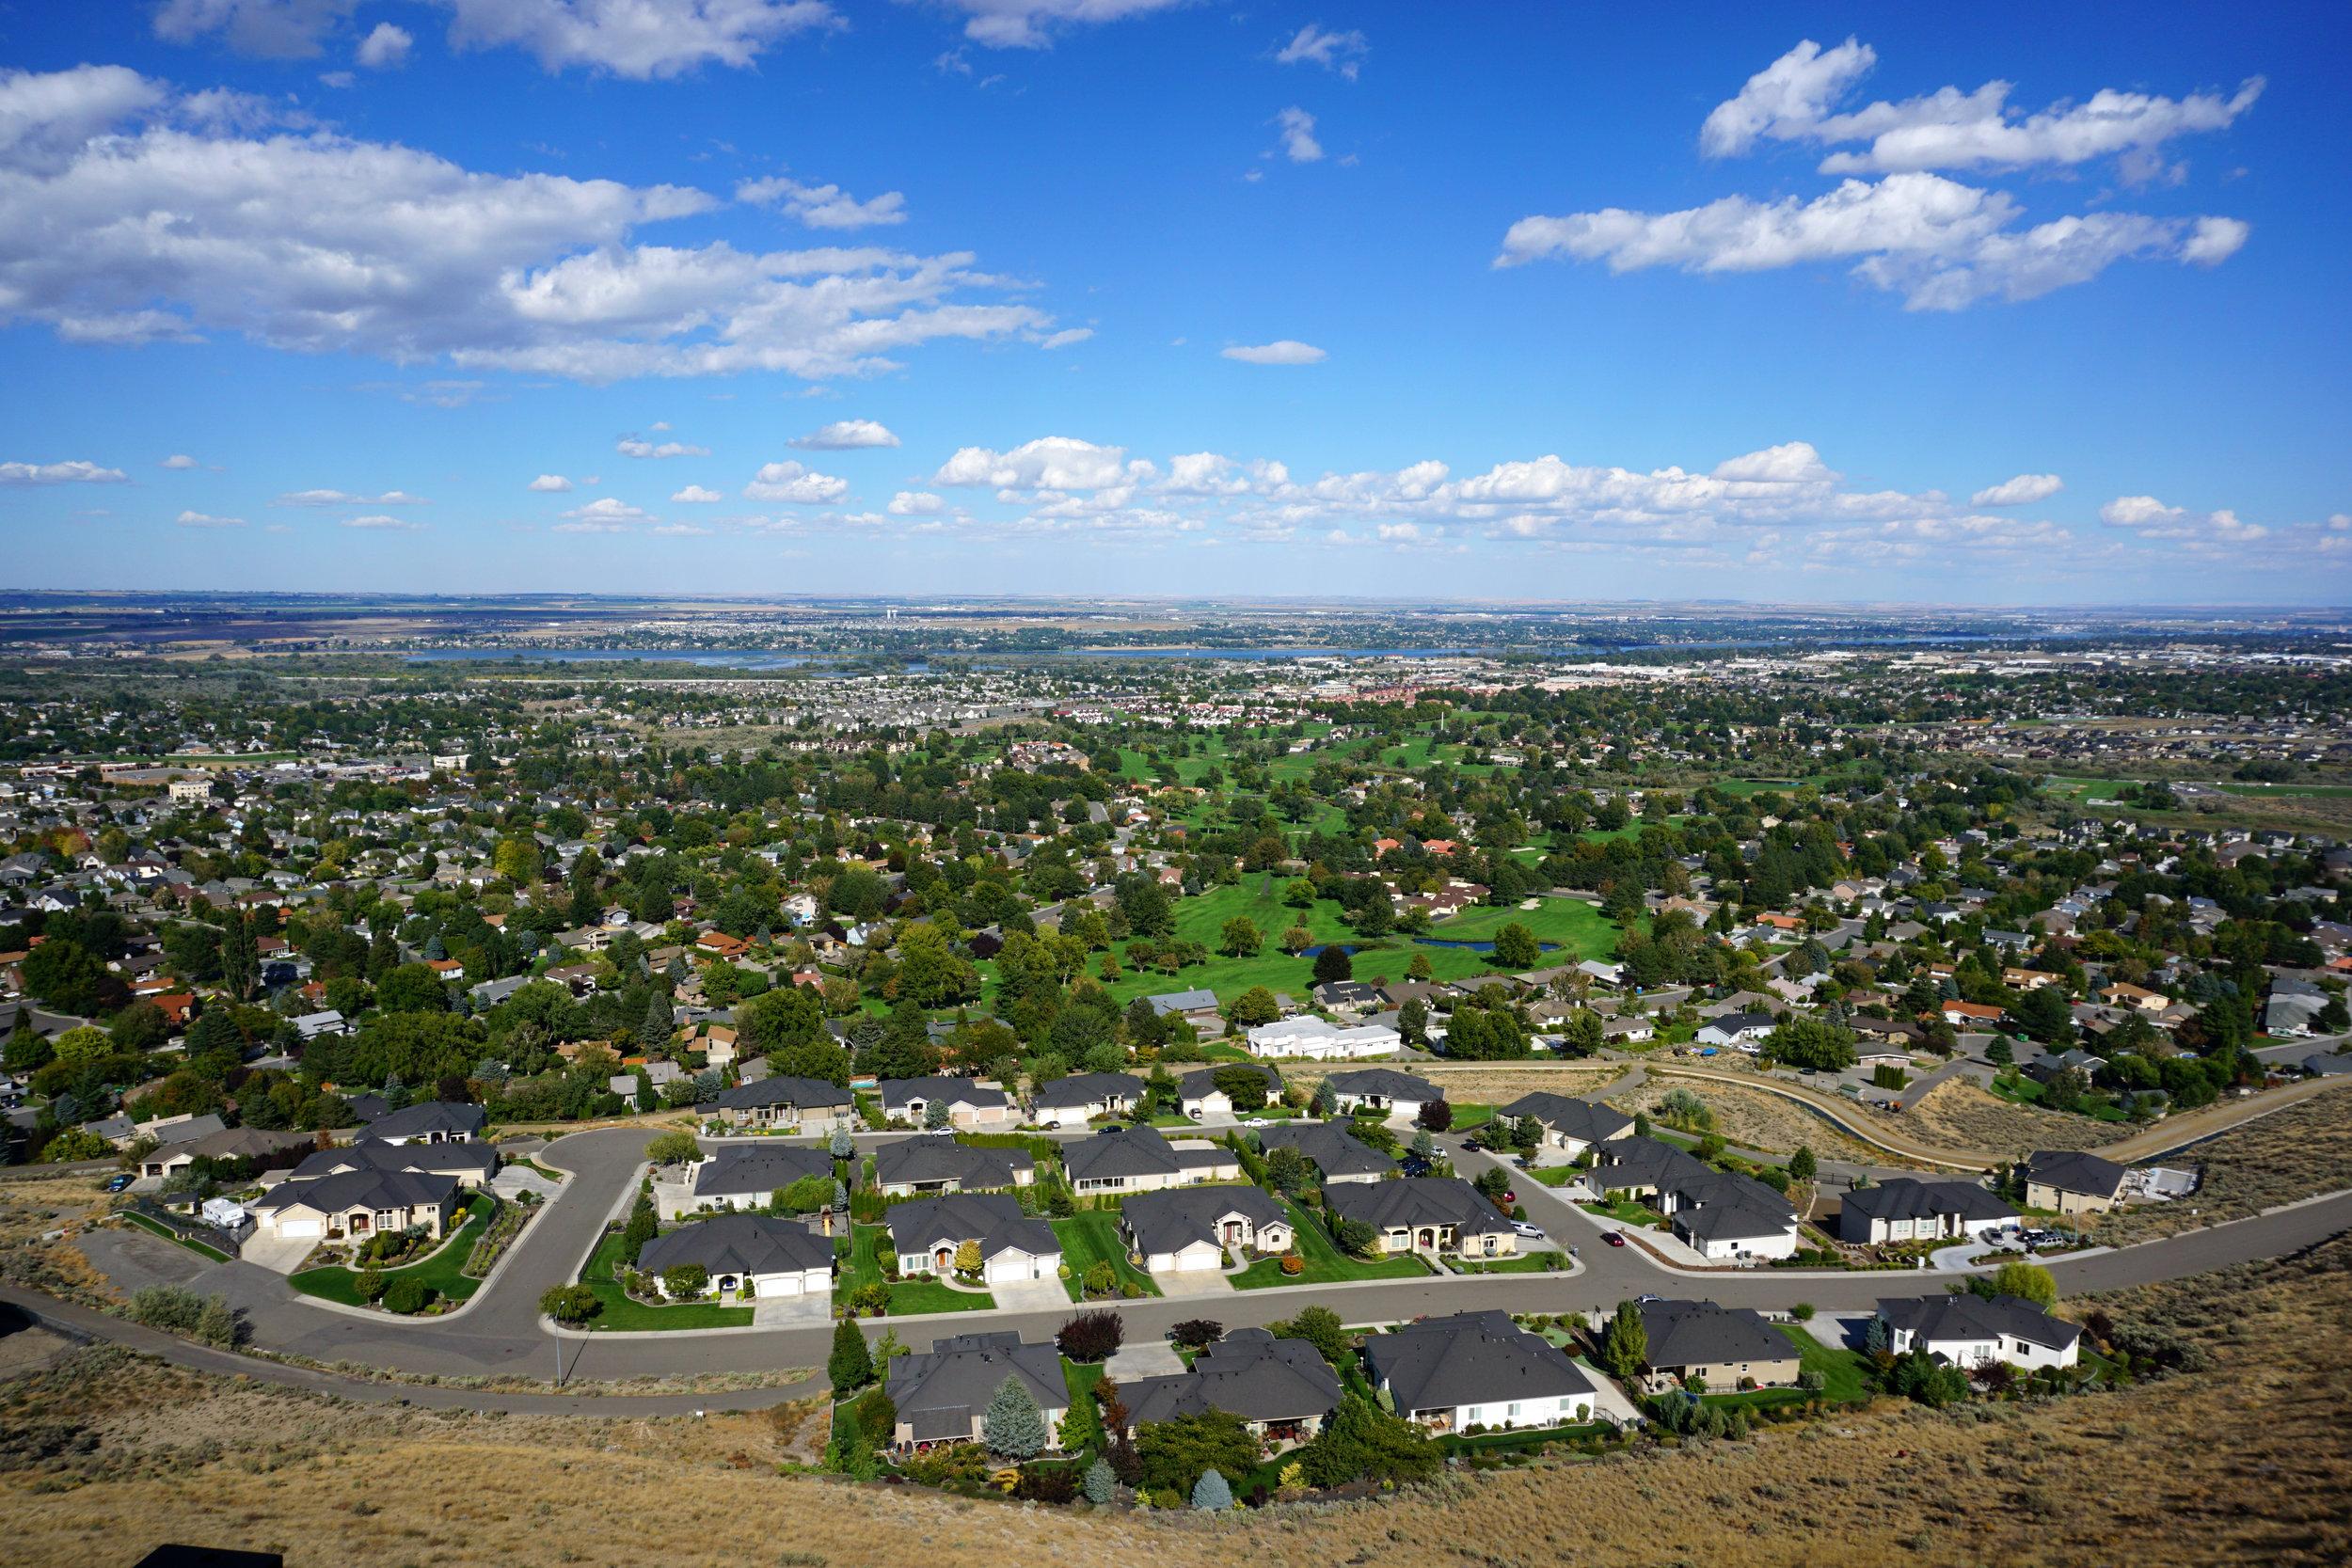 Tri-Cities - 8200 W Grandridge Blvd • Kennewick, Washington 99336p: 509.736.3344 | e: tricities@northwestrealtors.com